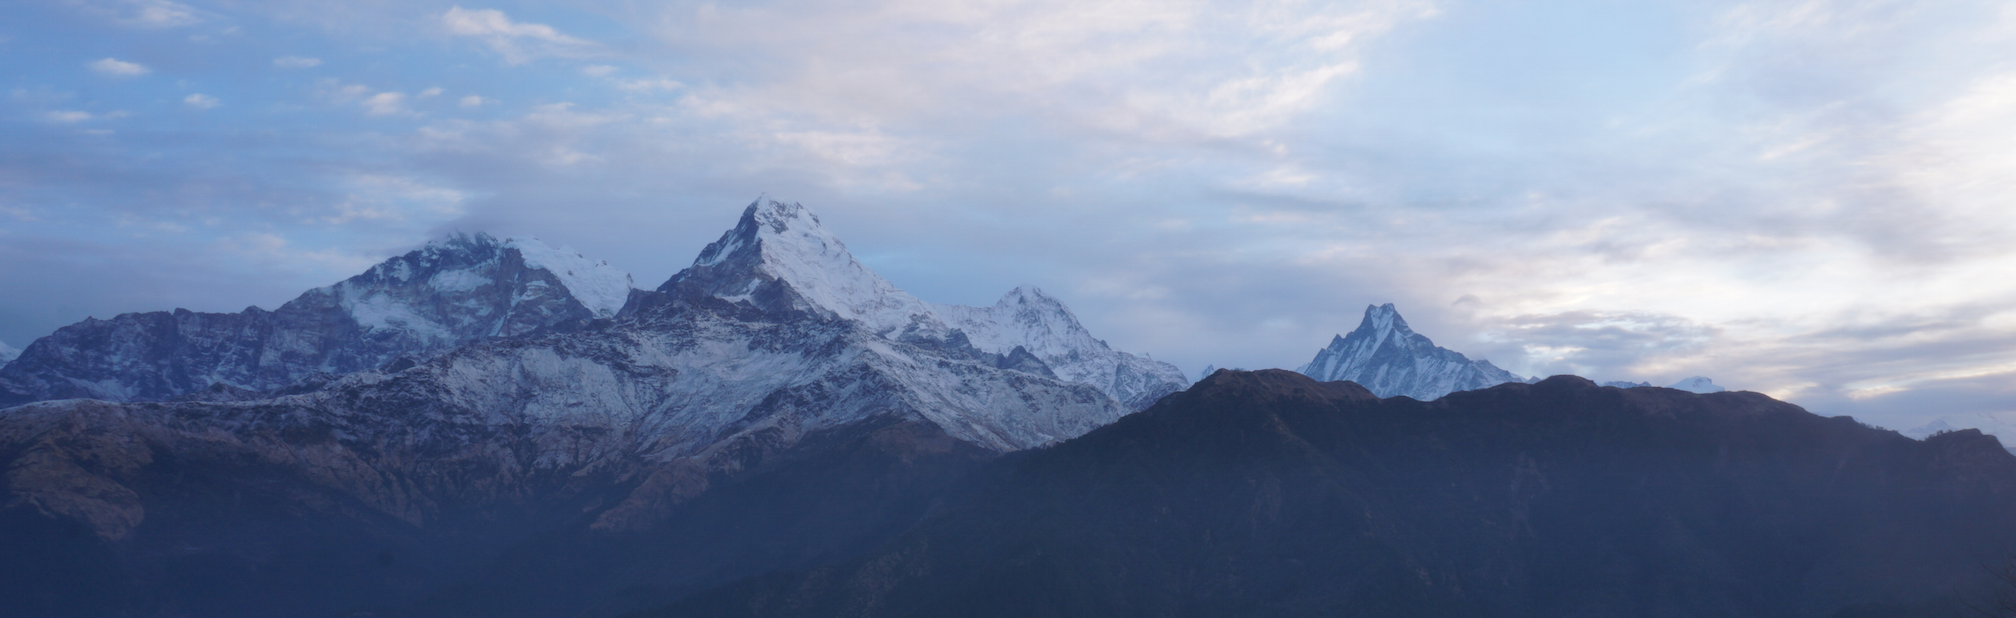 Les Annapurnas vu de Poon Hill, Népal. Mars 2017.